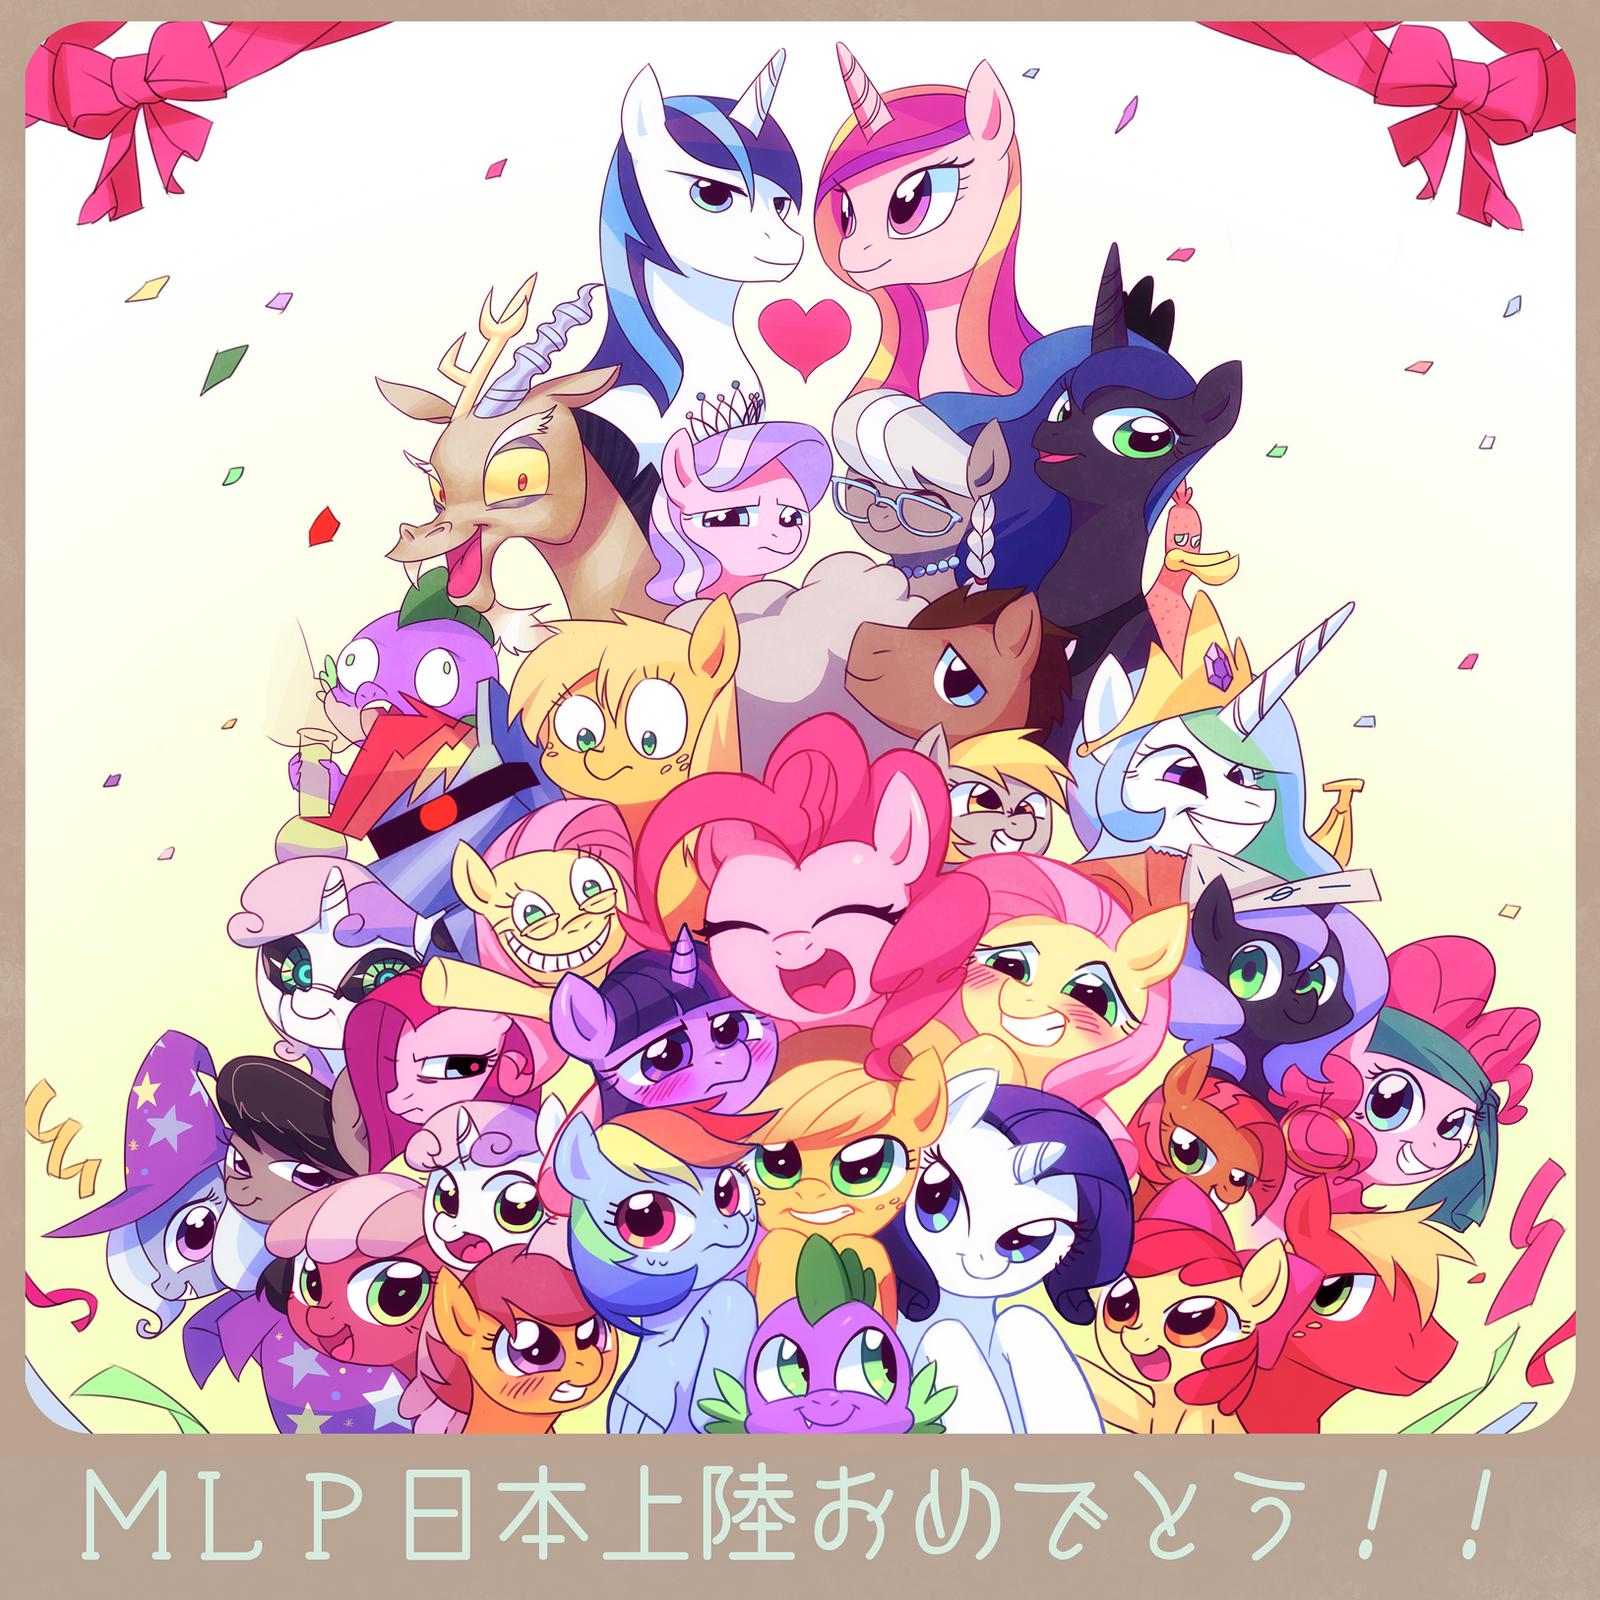 MLP in Japan by aruurara